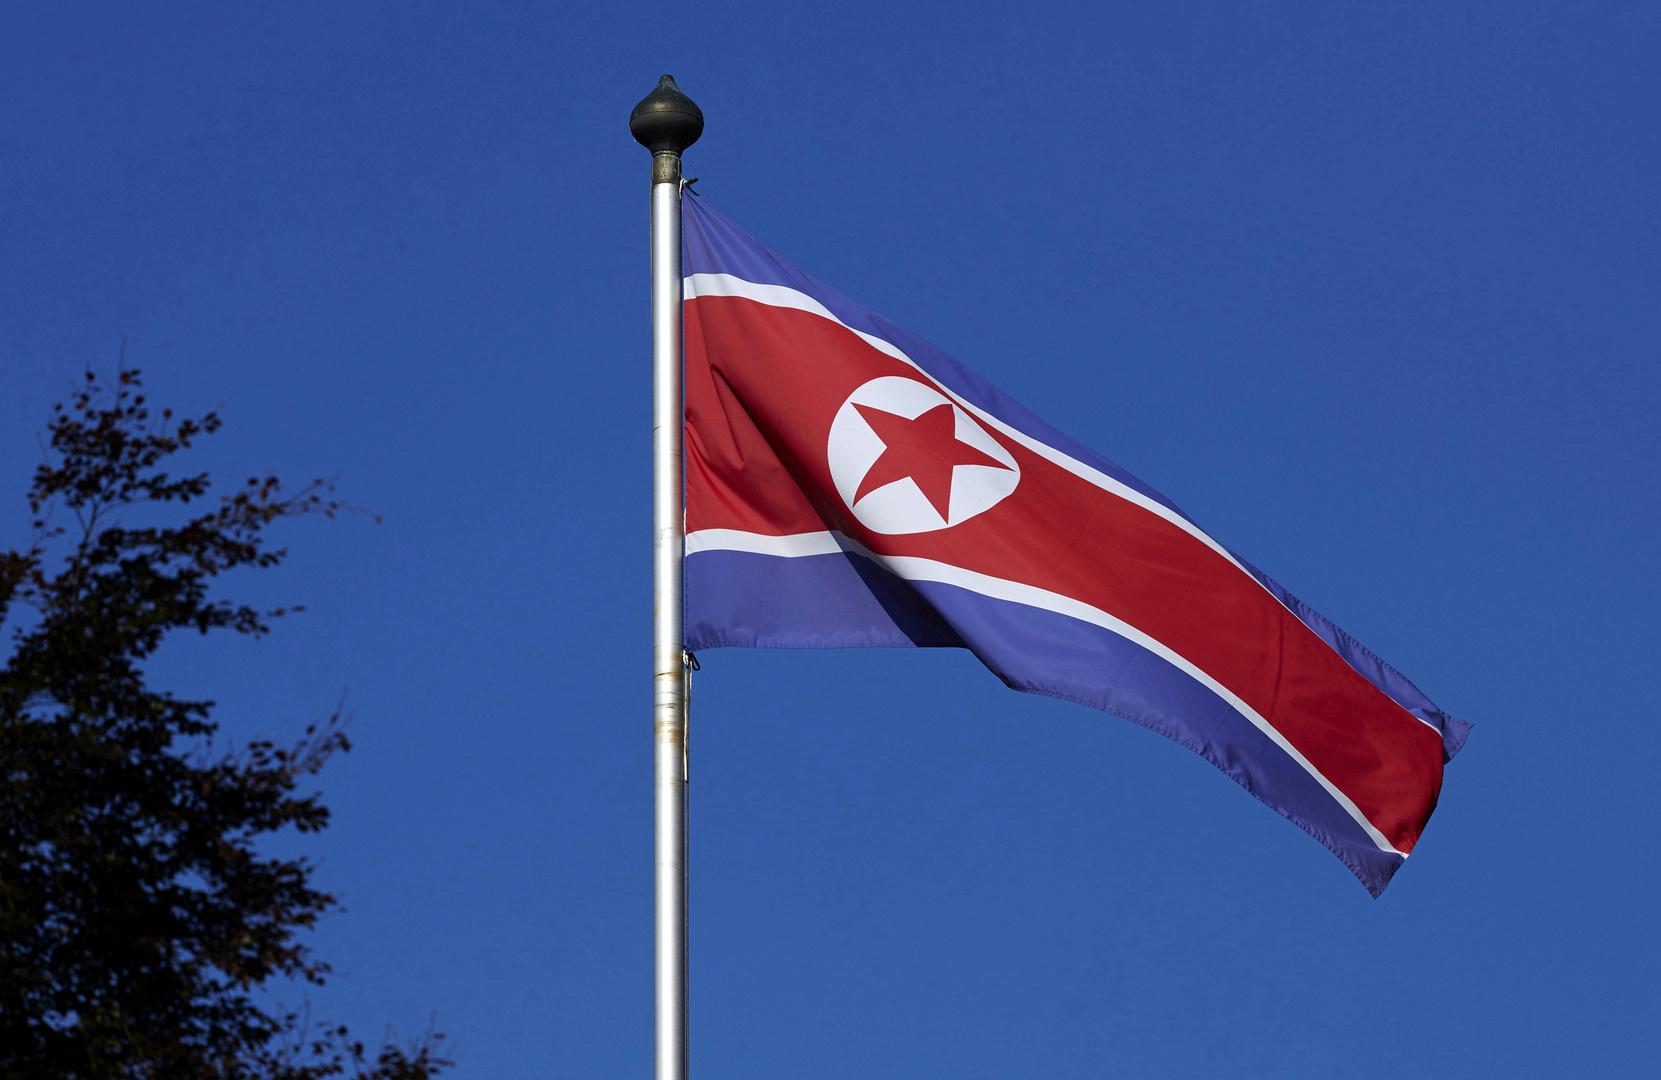 Parliamentary source: North Korea's acting ambassador to Kuwait fled to South Korea